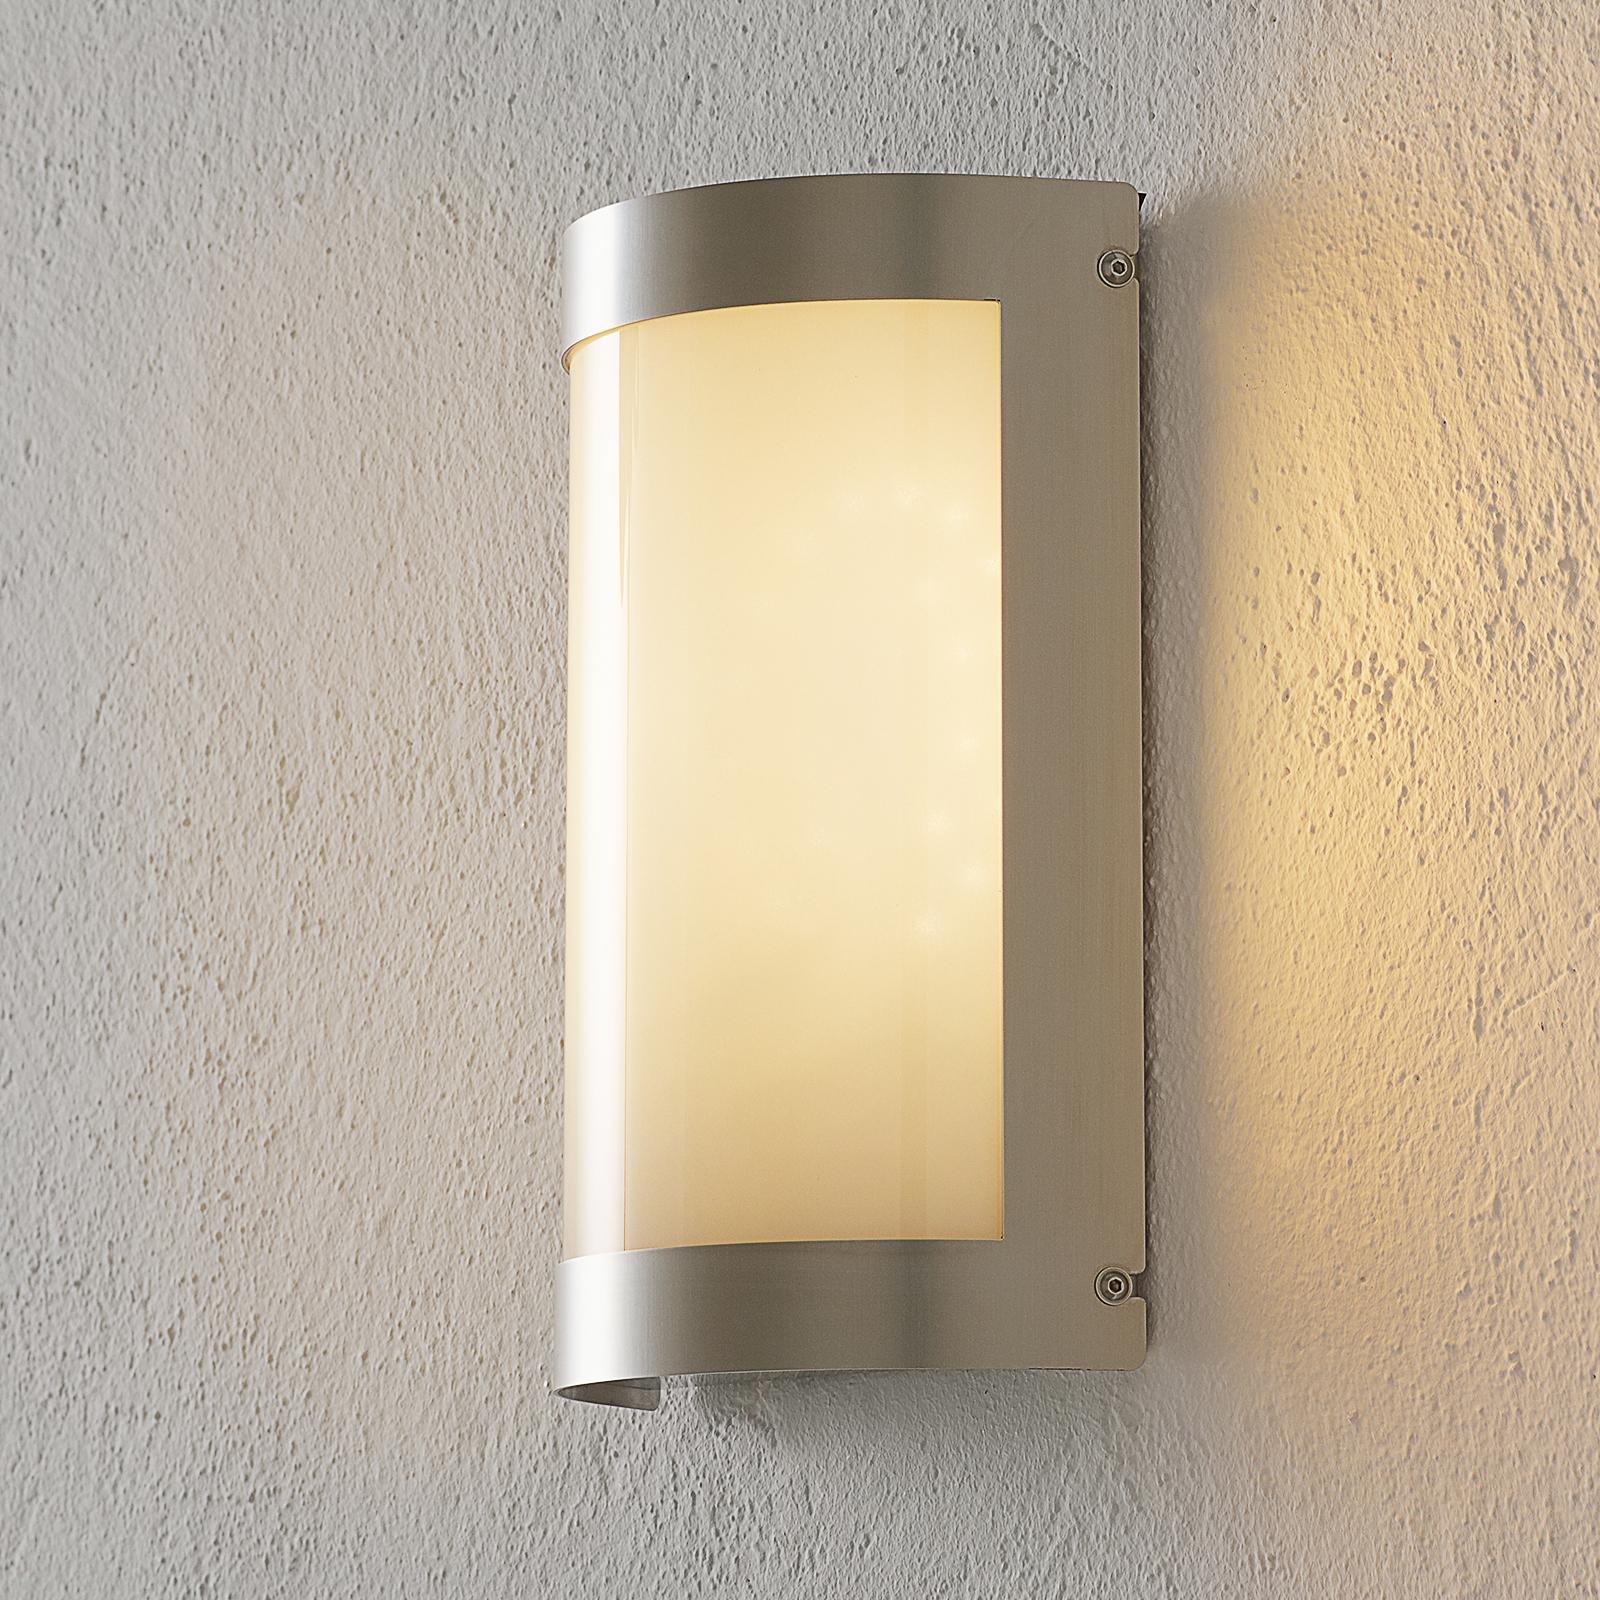 Aqua Marco LED-lampe med sensor, rustfrit stål